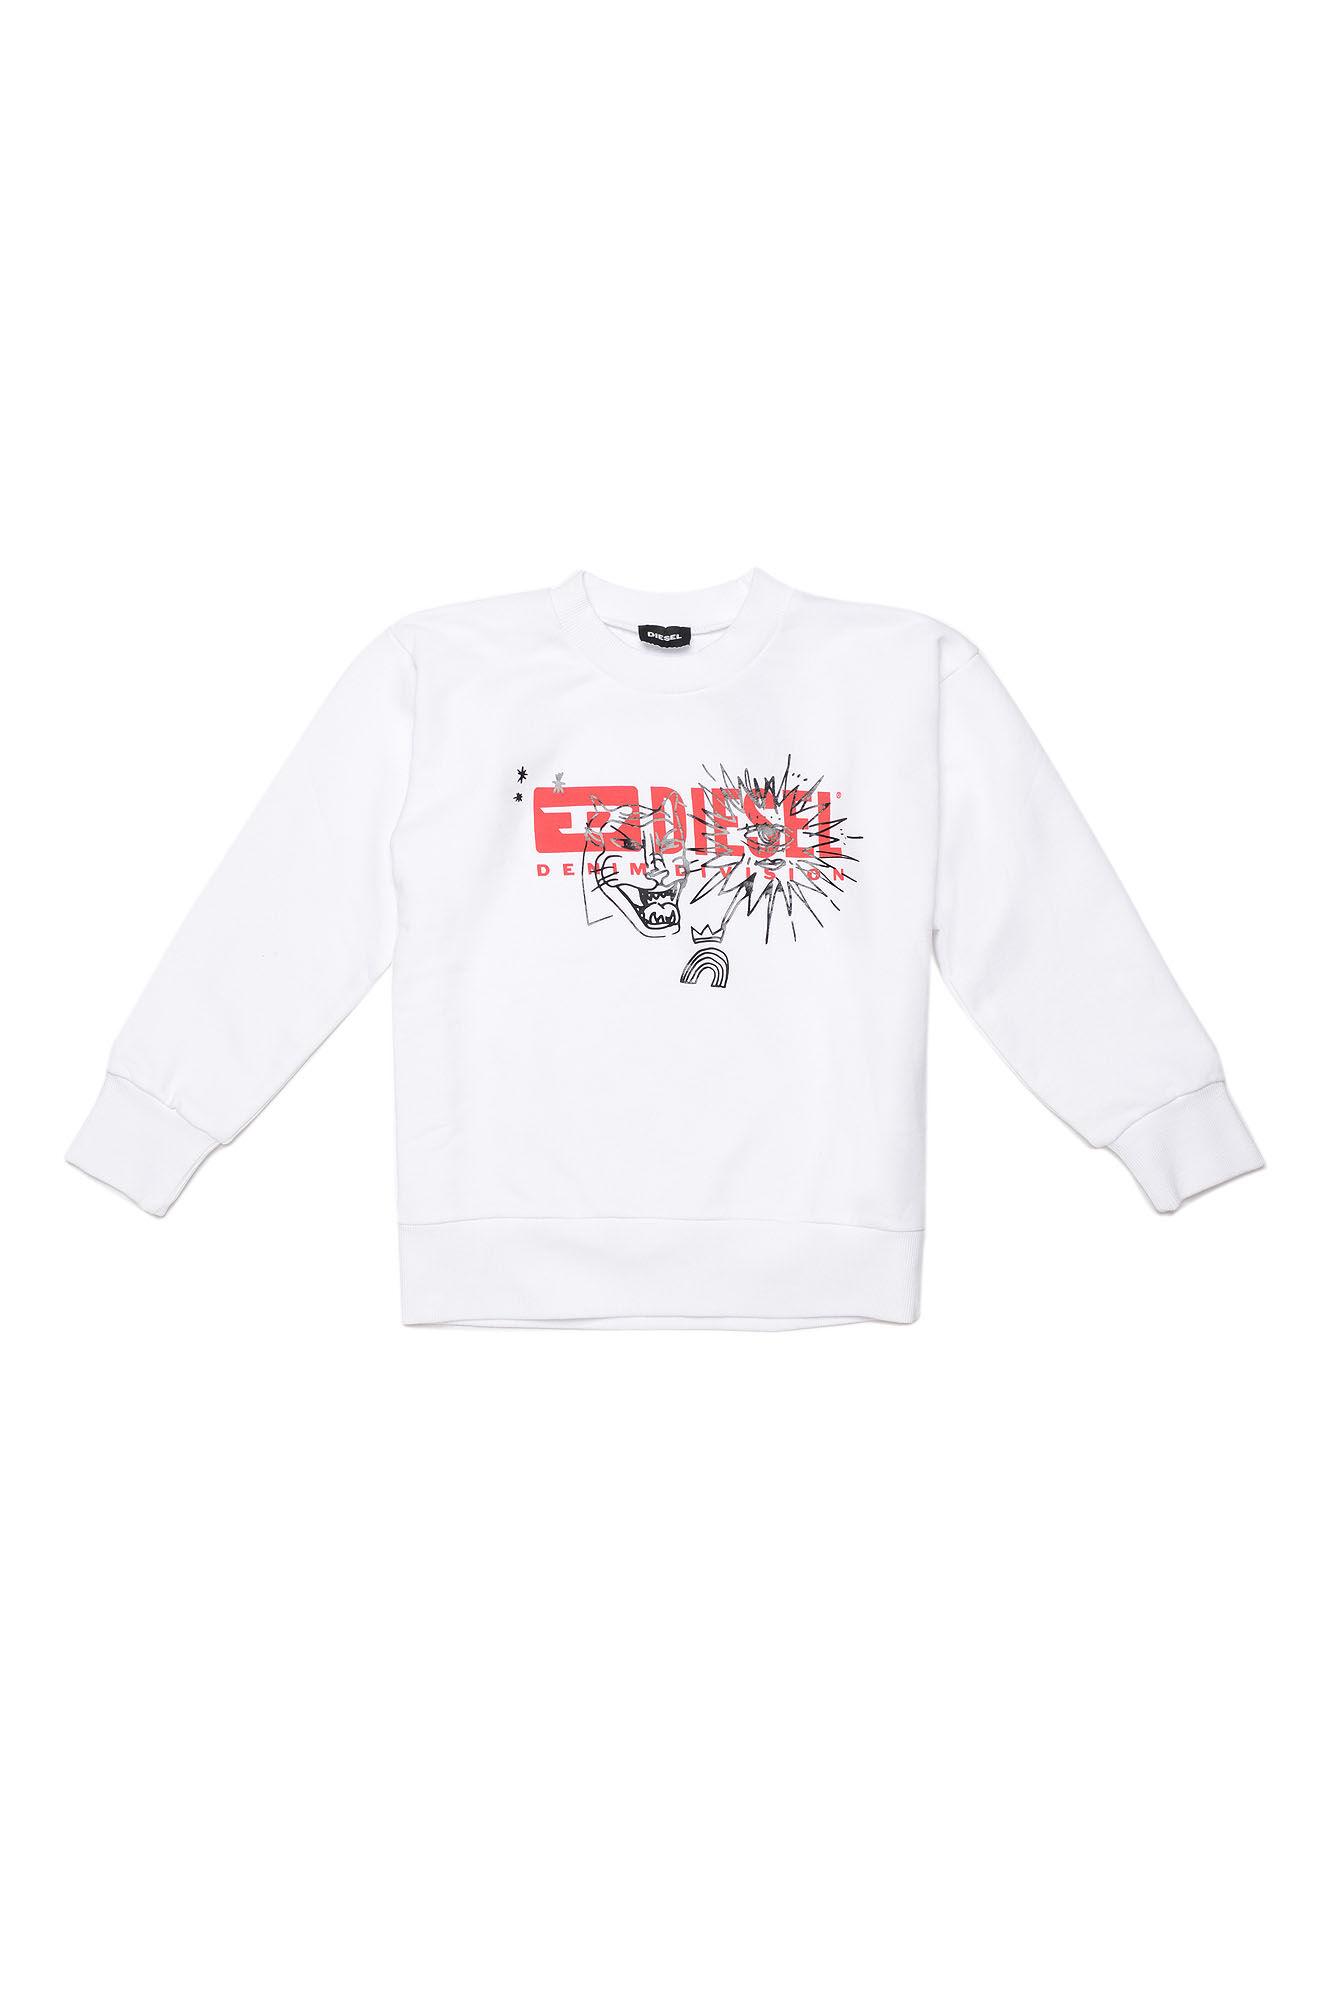 Sung Over Sweatshirt - Diesel Kid